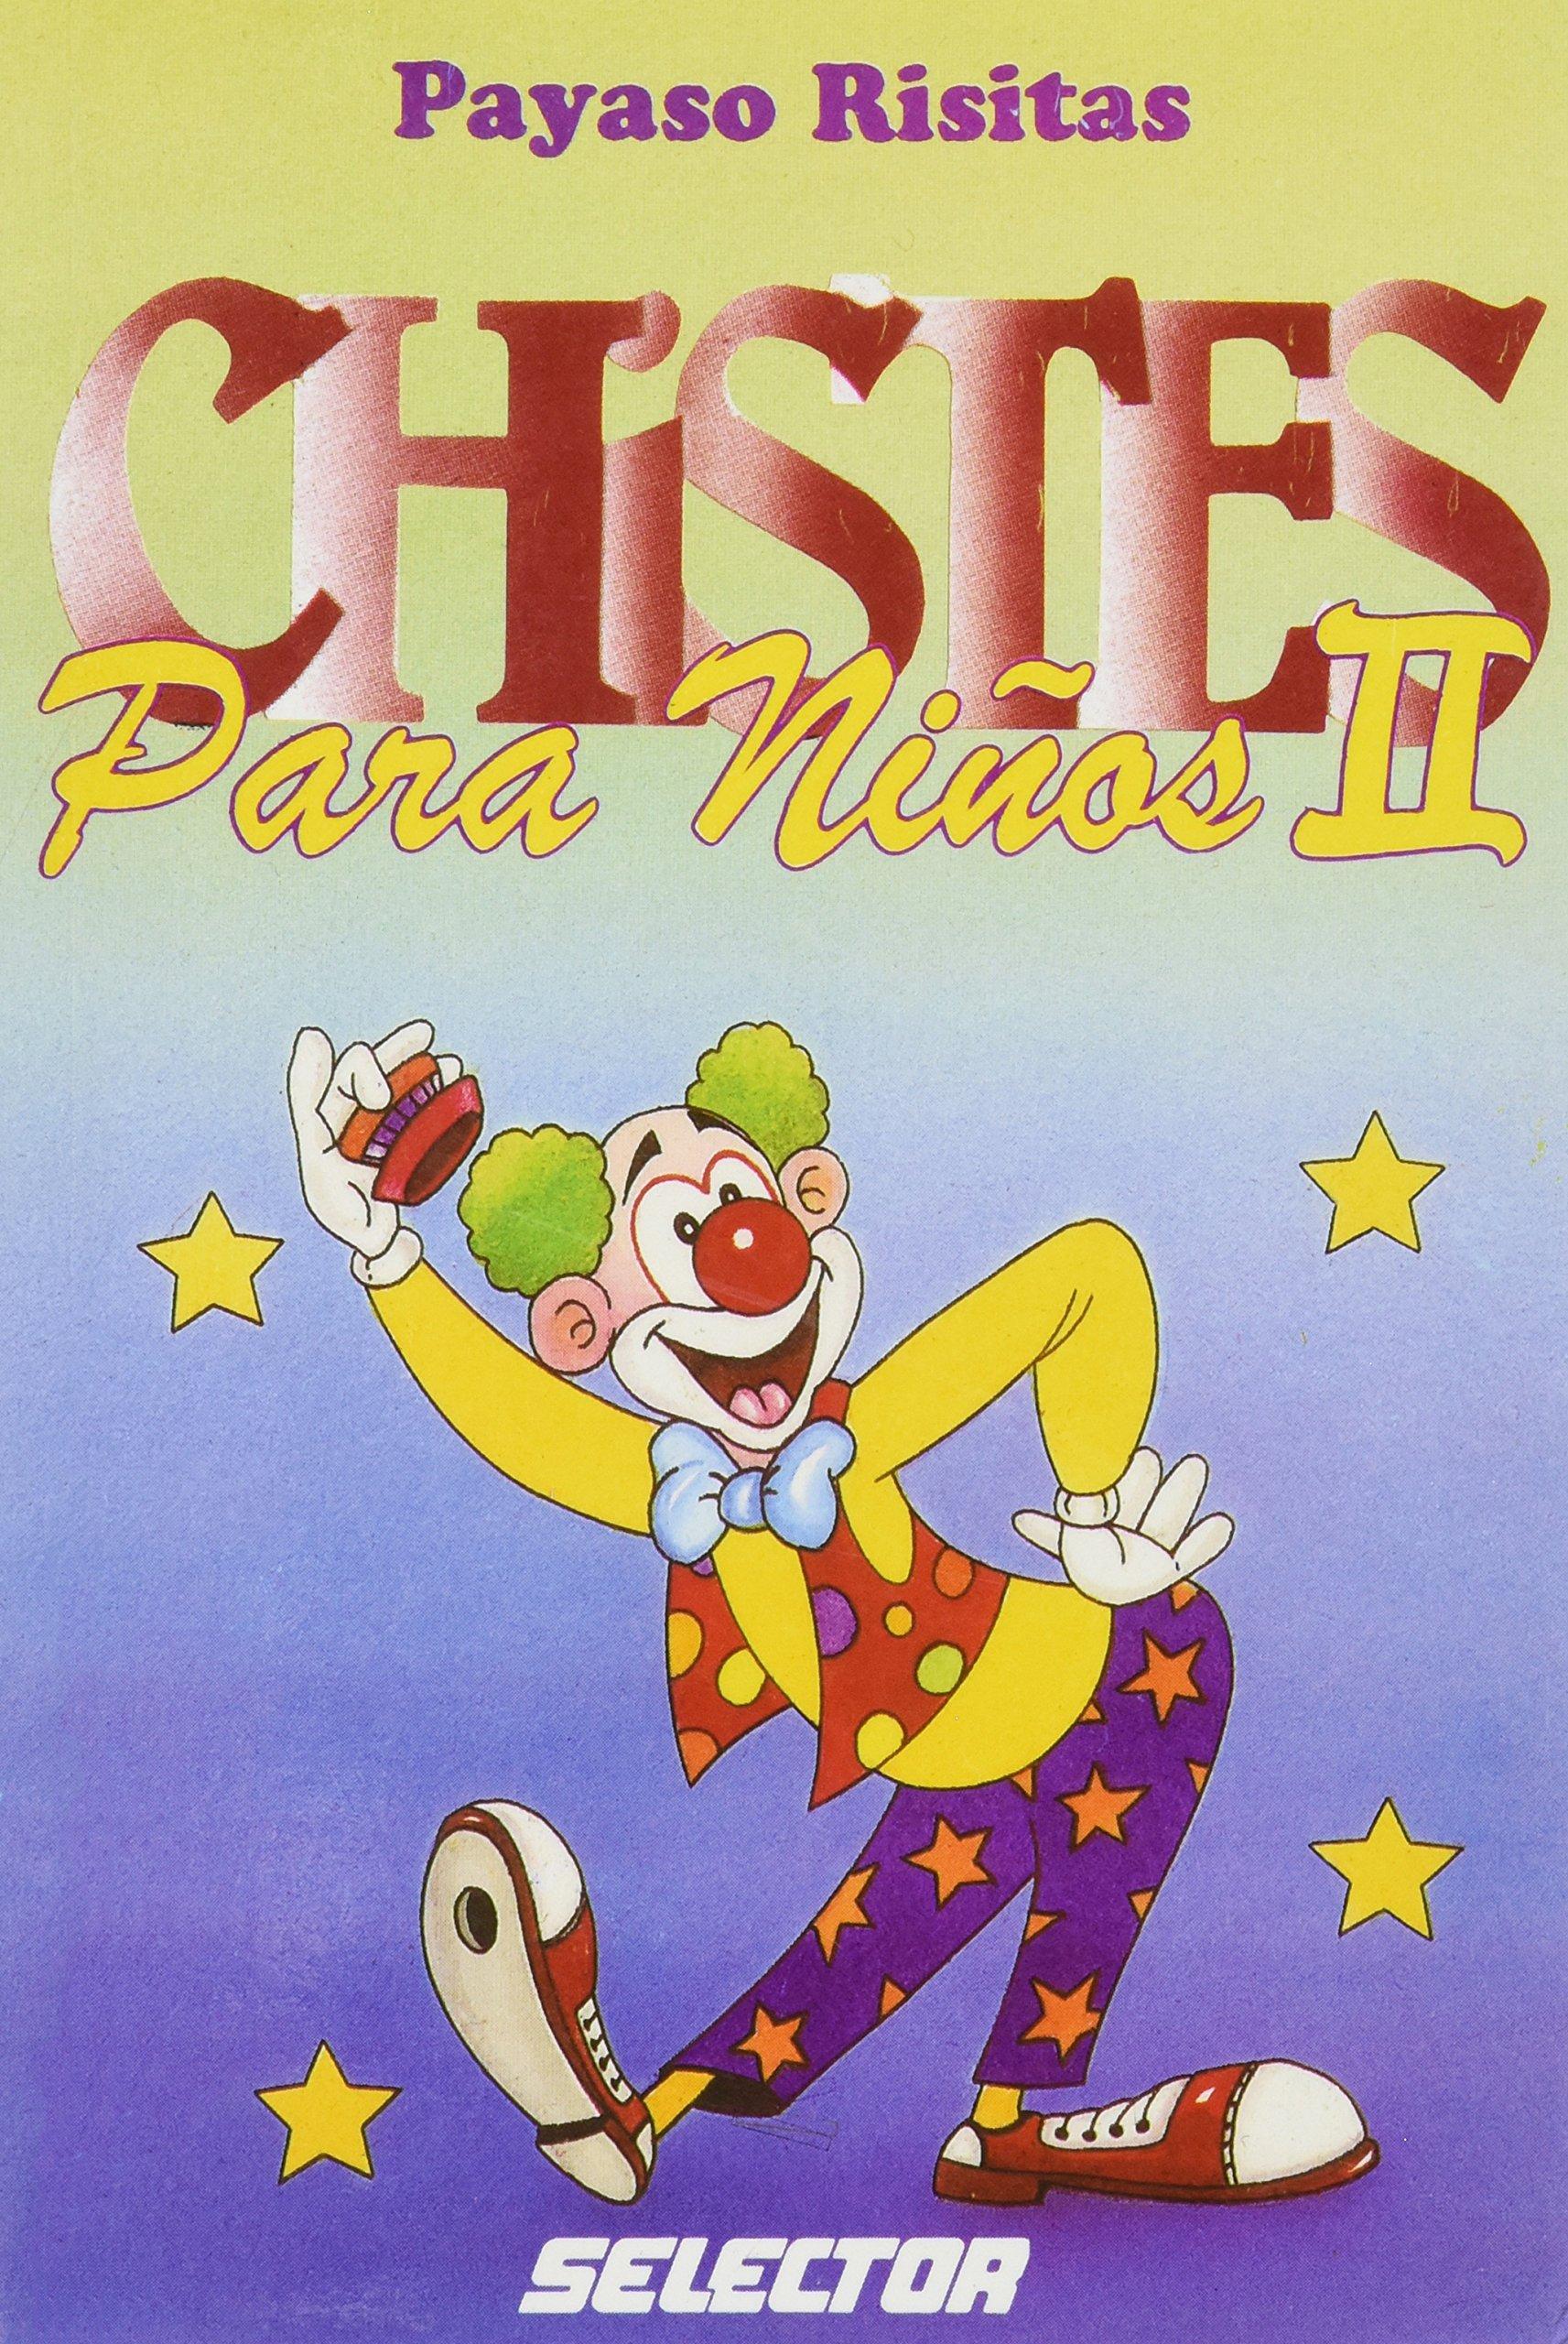 Chistes Para Ninos Jokes For Children Spanish Edition 9789706432650 Payaso Risitas Books